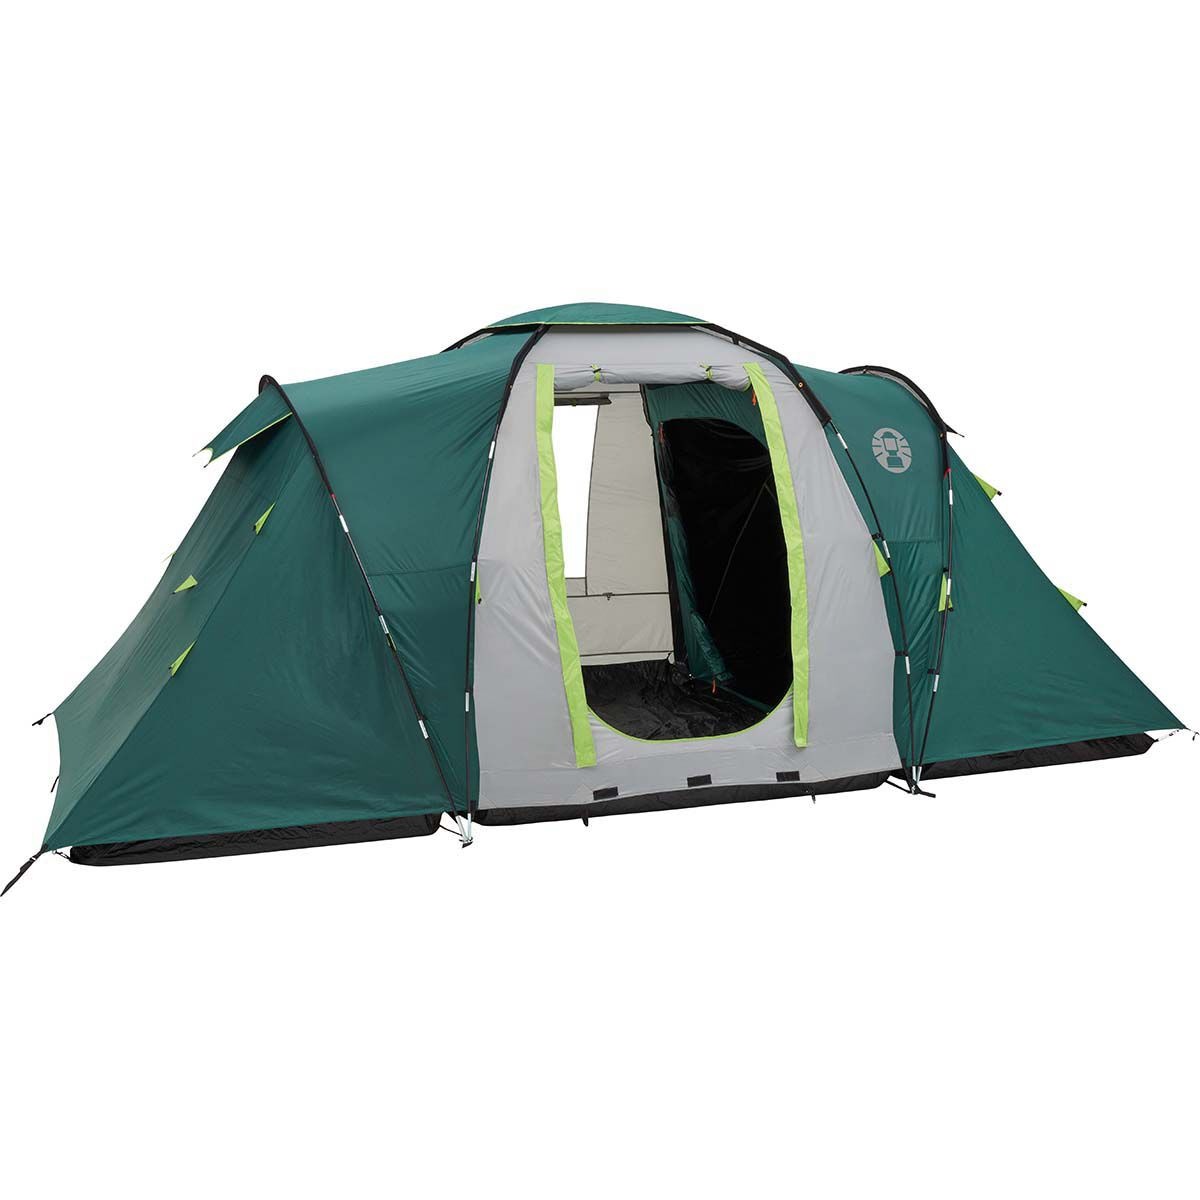 Coleman Spruce Falls Darkroom Dome Tent 6 Person  bcf_hi-res  sc 1 st  BCF Australia & Coleman Spruce Falls Darkroom Dome Tent 6 Person | BCF